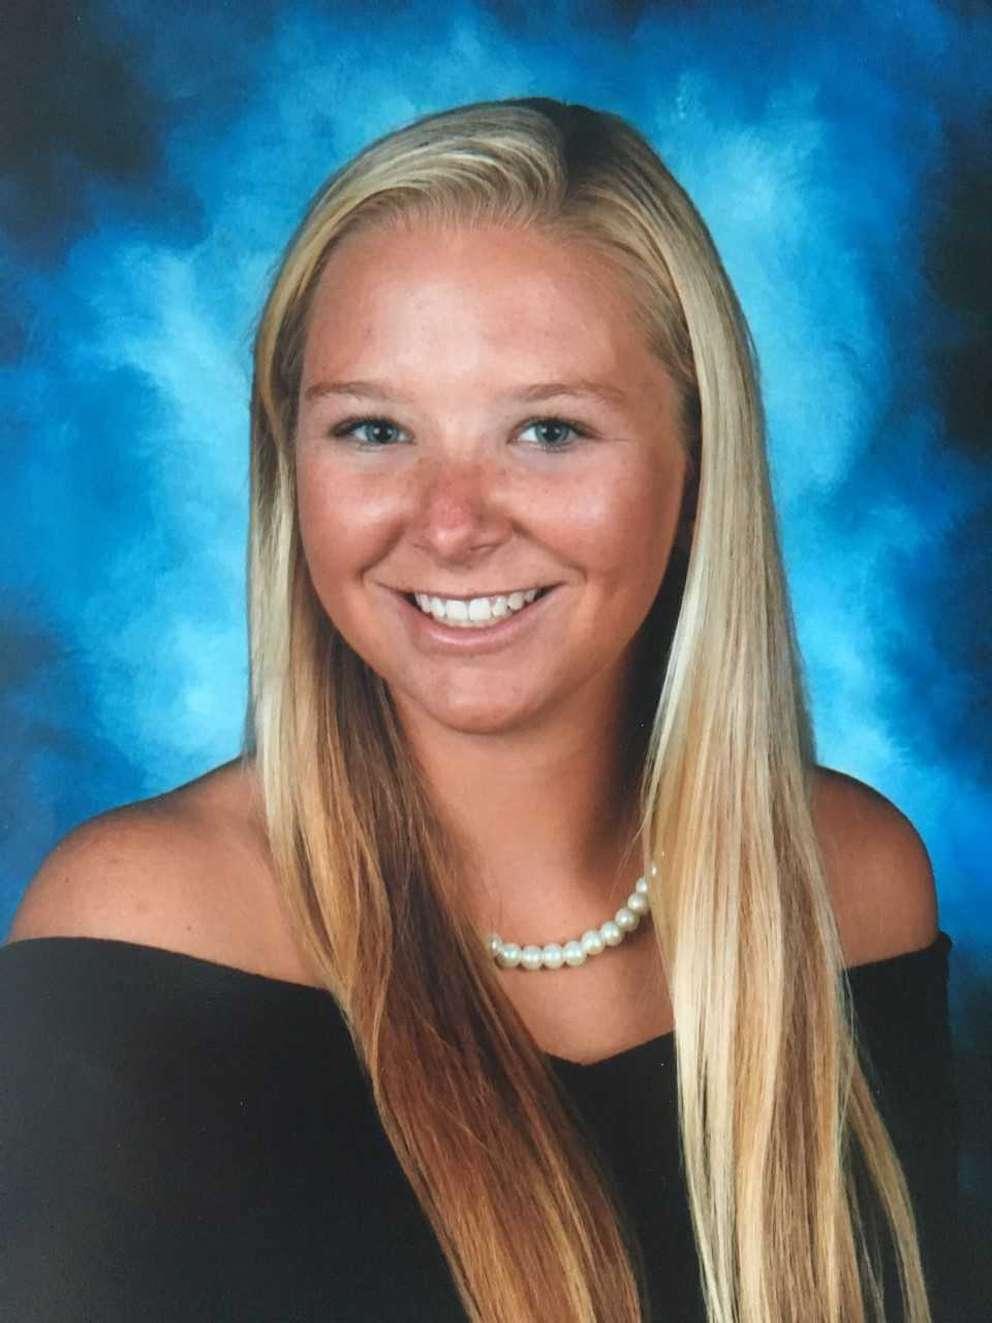 Blaire Ingrid McCarthy is the 2018 valedictorian at St. Petersburg High School.